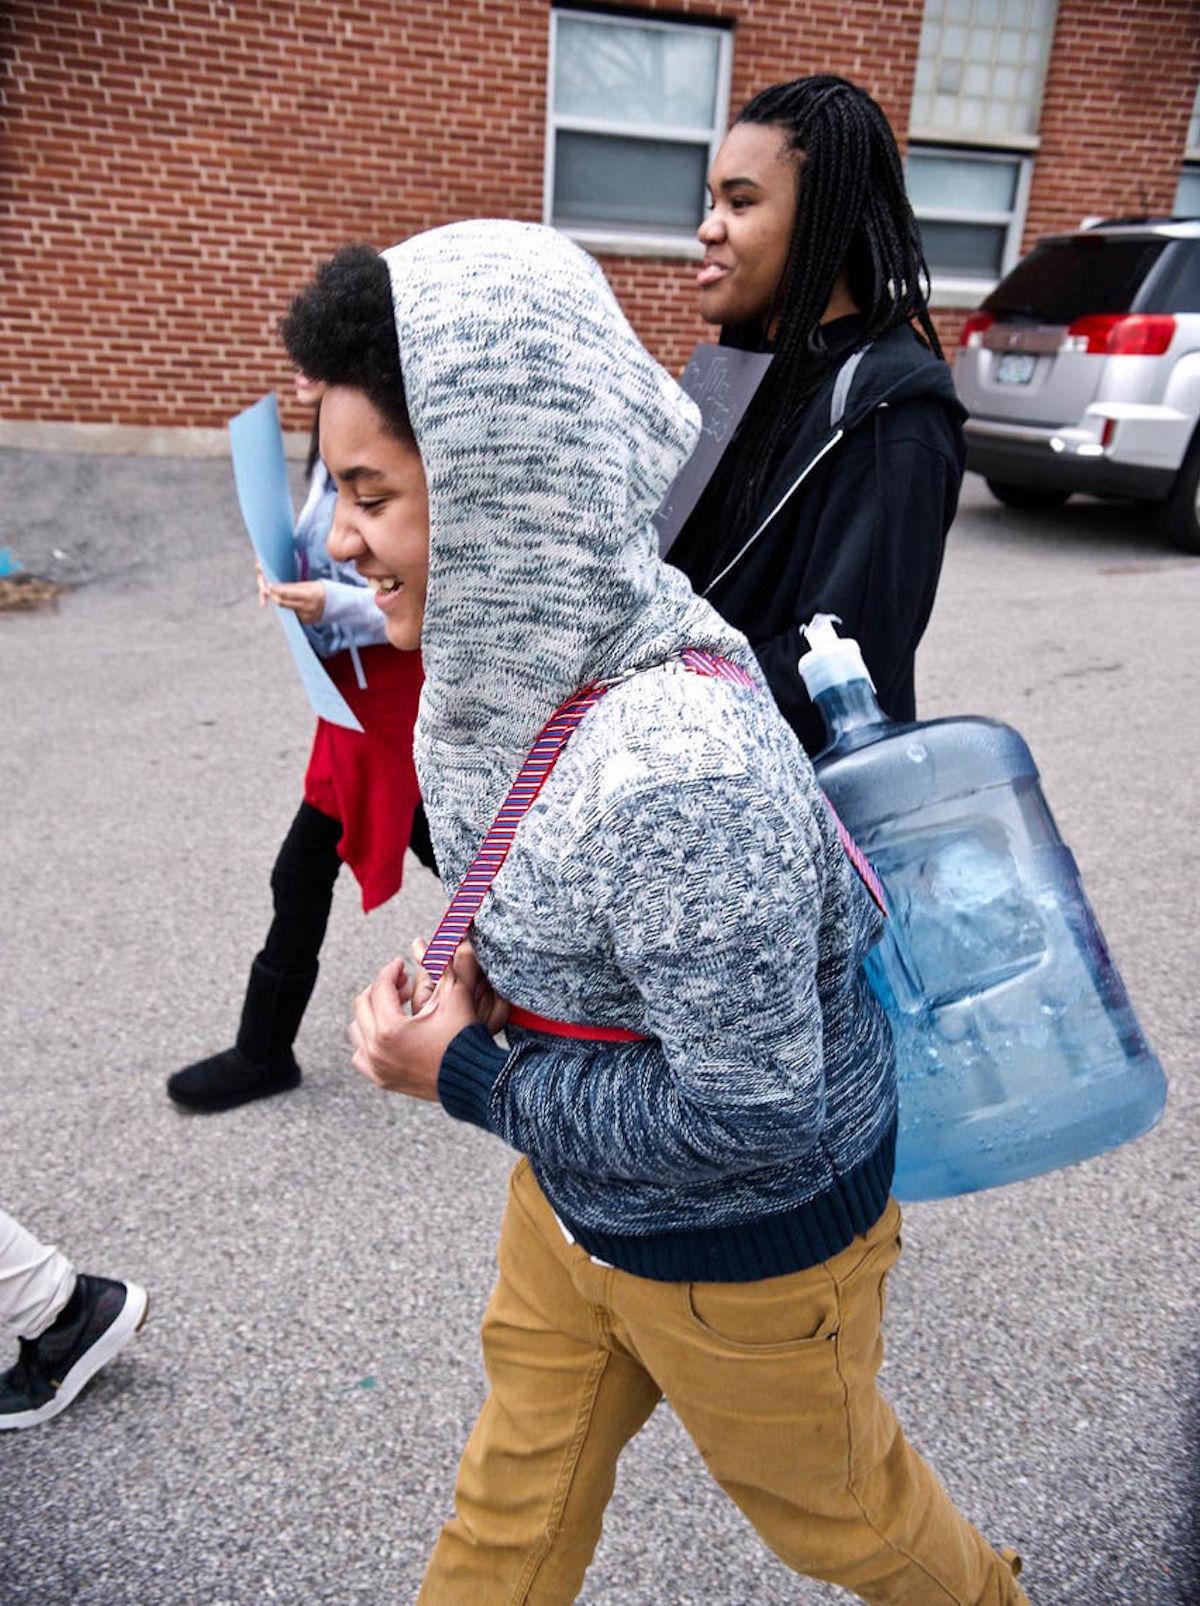 Jennings Junior High School, Walk for Water, Kenya, African American Activism, African American Activist, KOLUMN Magazine, KOLUMN